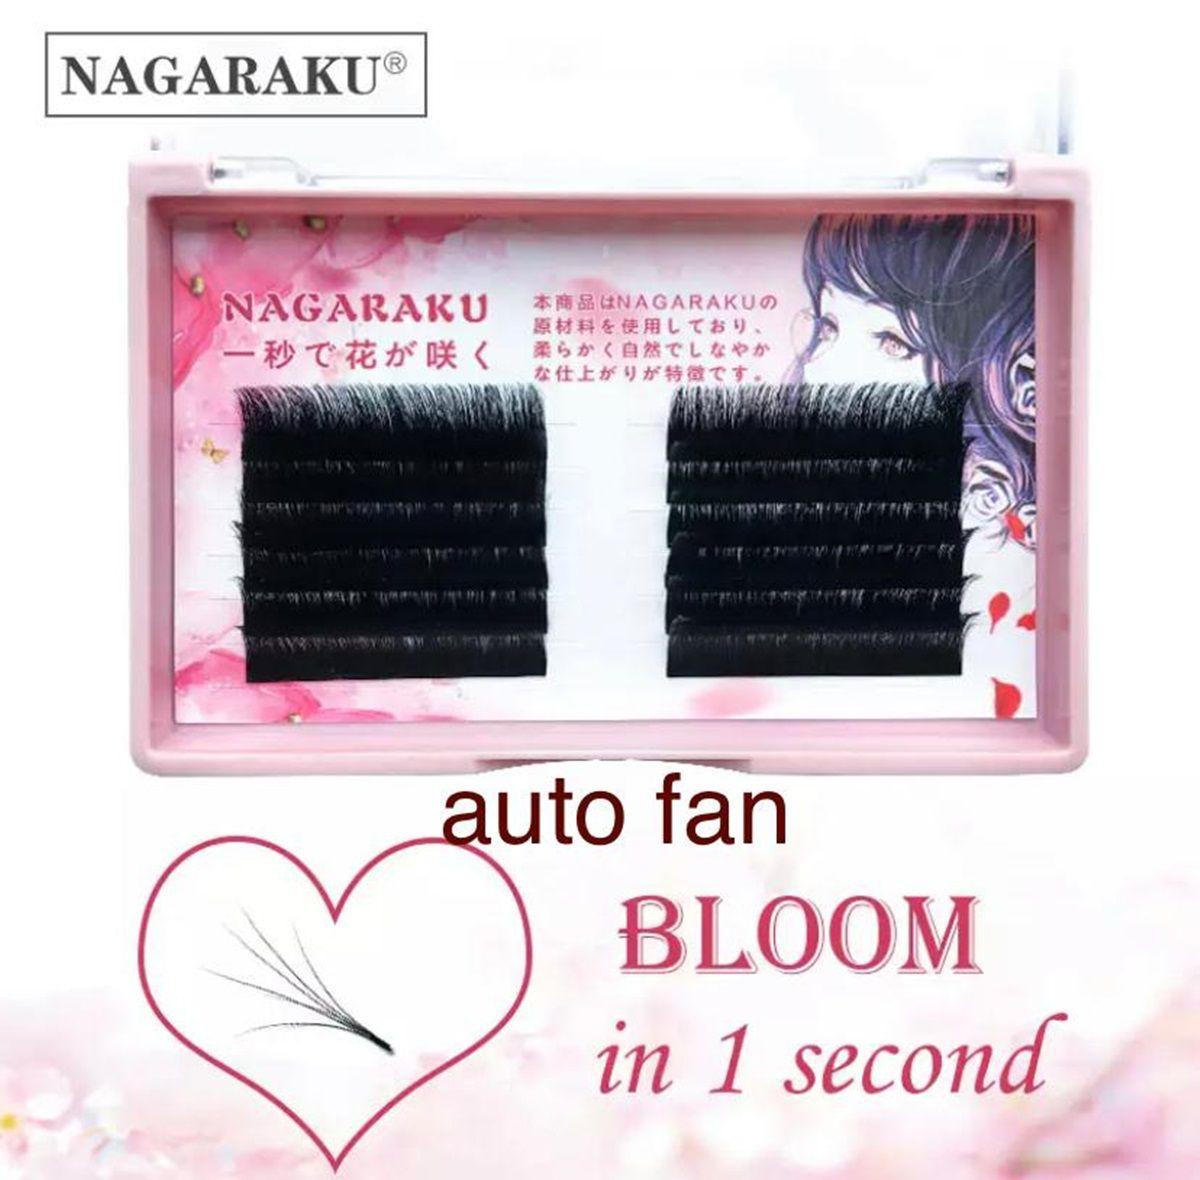 Cílios Nagaraku Auto Fan 0.03 D Volume Russo Mix 10-12-14mm